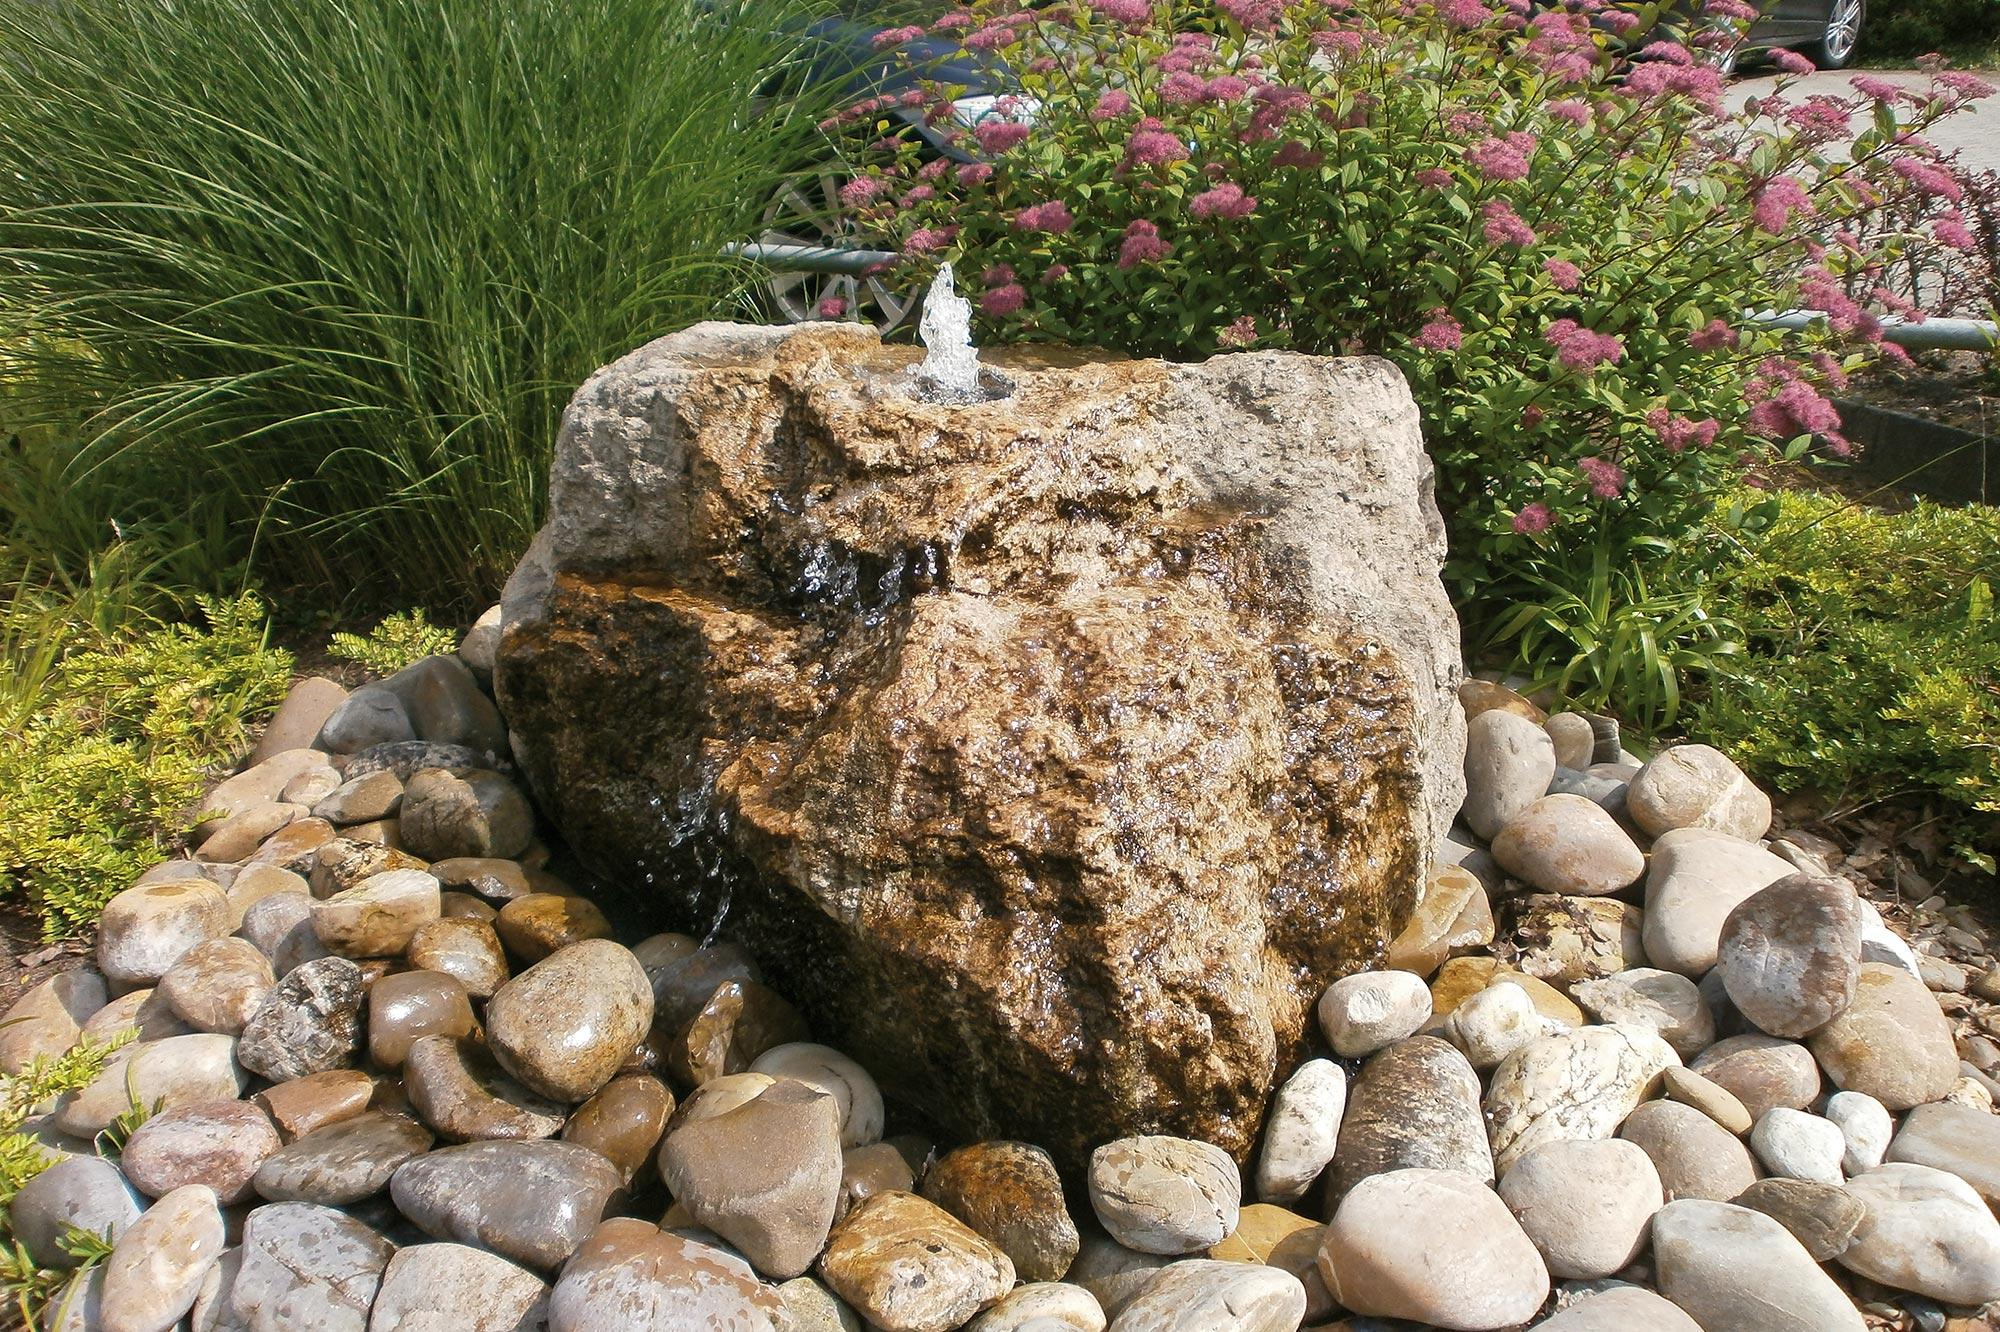 Gartenbrunnen Materialien Gartenbrunnen Wasserspiel Stein Garten